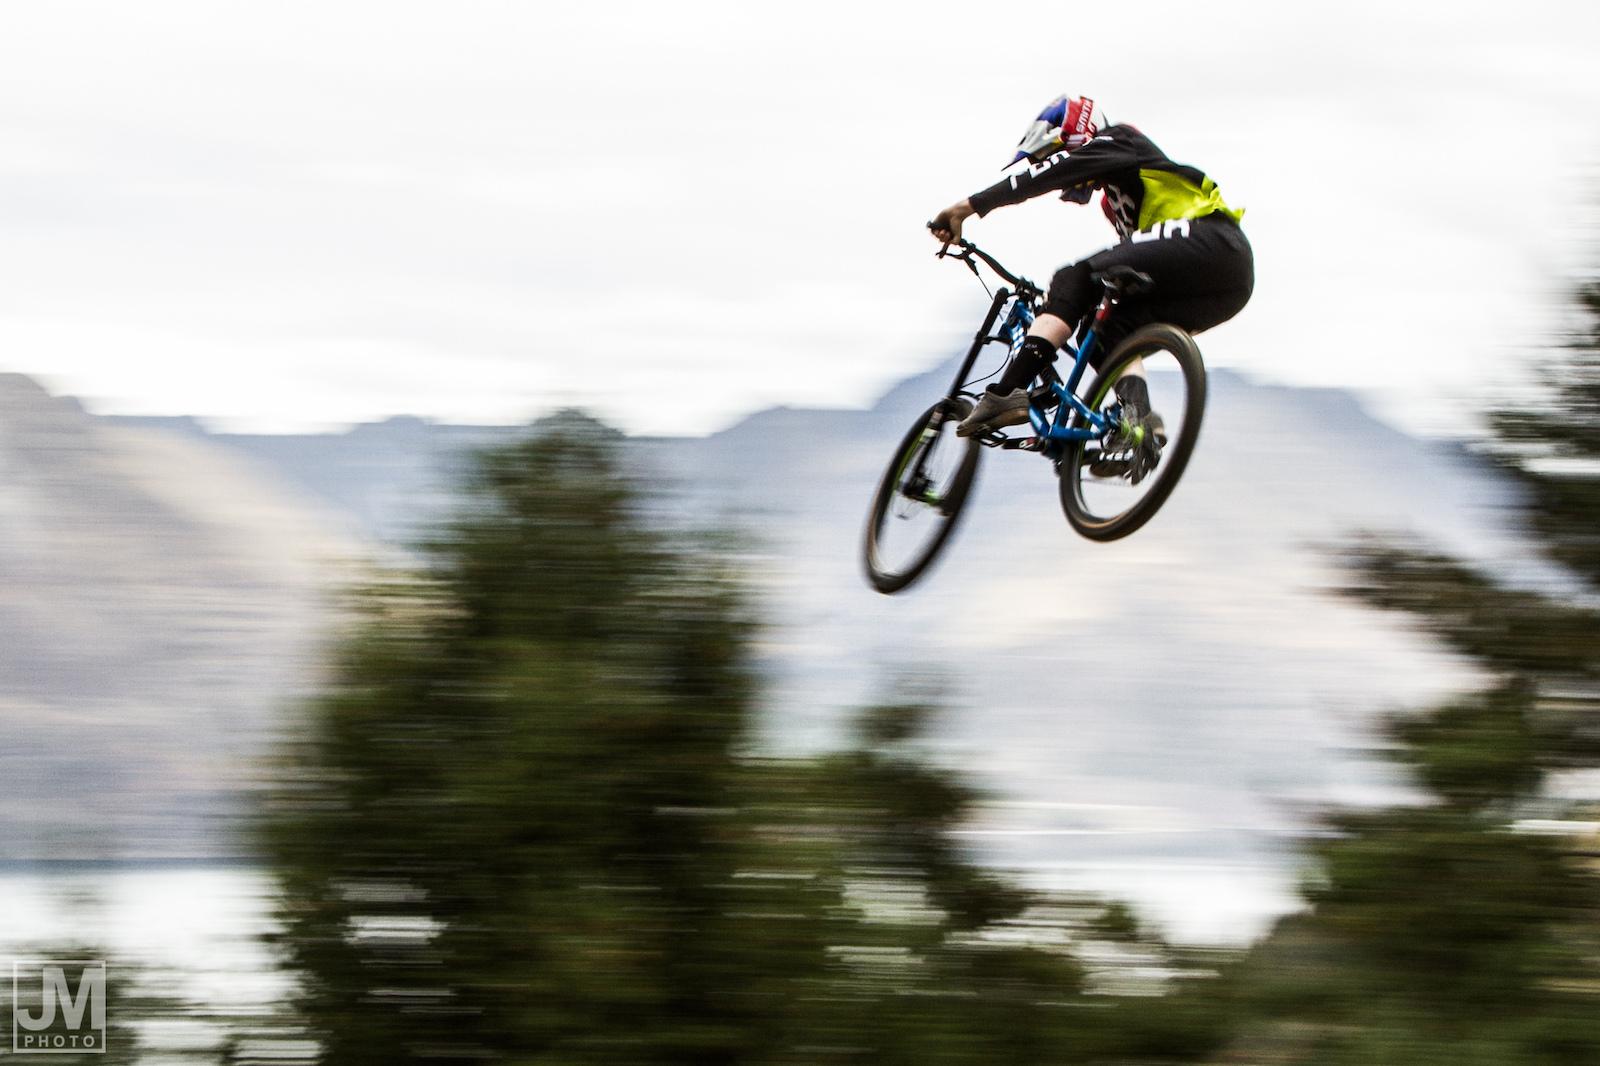 joshmoore16 - Anton Thelander Dream Track New Zealand